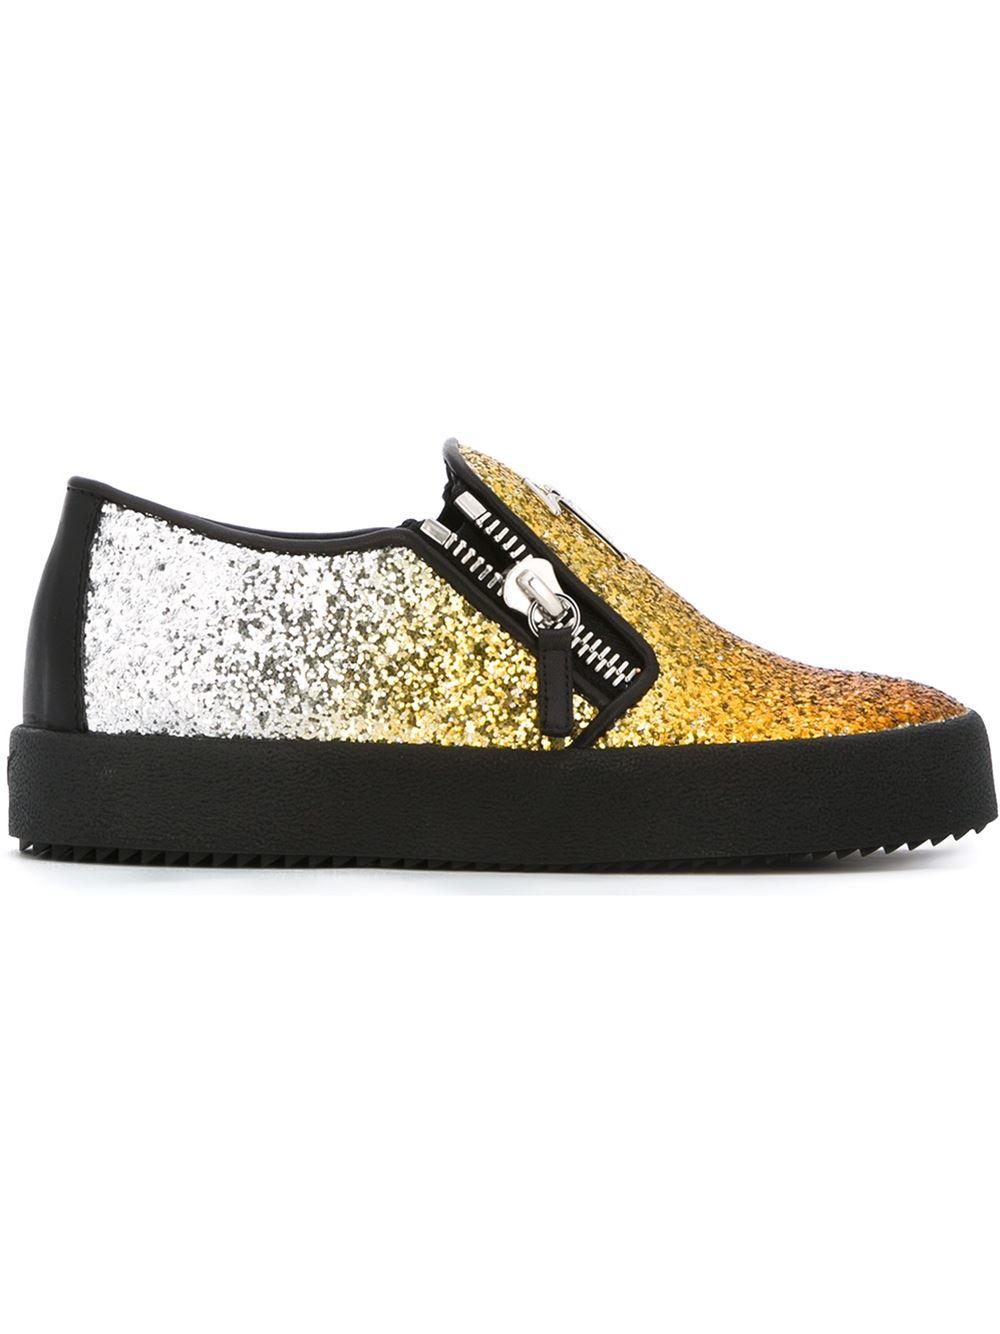 52cf217fac72d Giuseppe Zanotti 'Eve' Glitter Sneakers in Metallic - Lyst